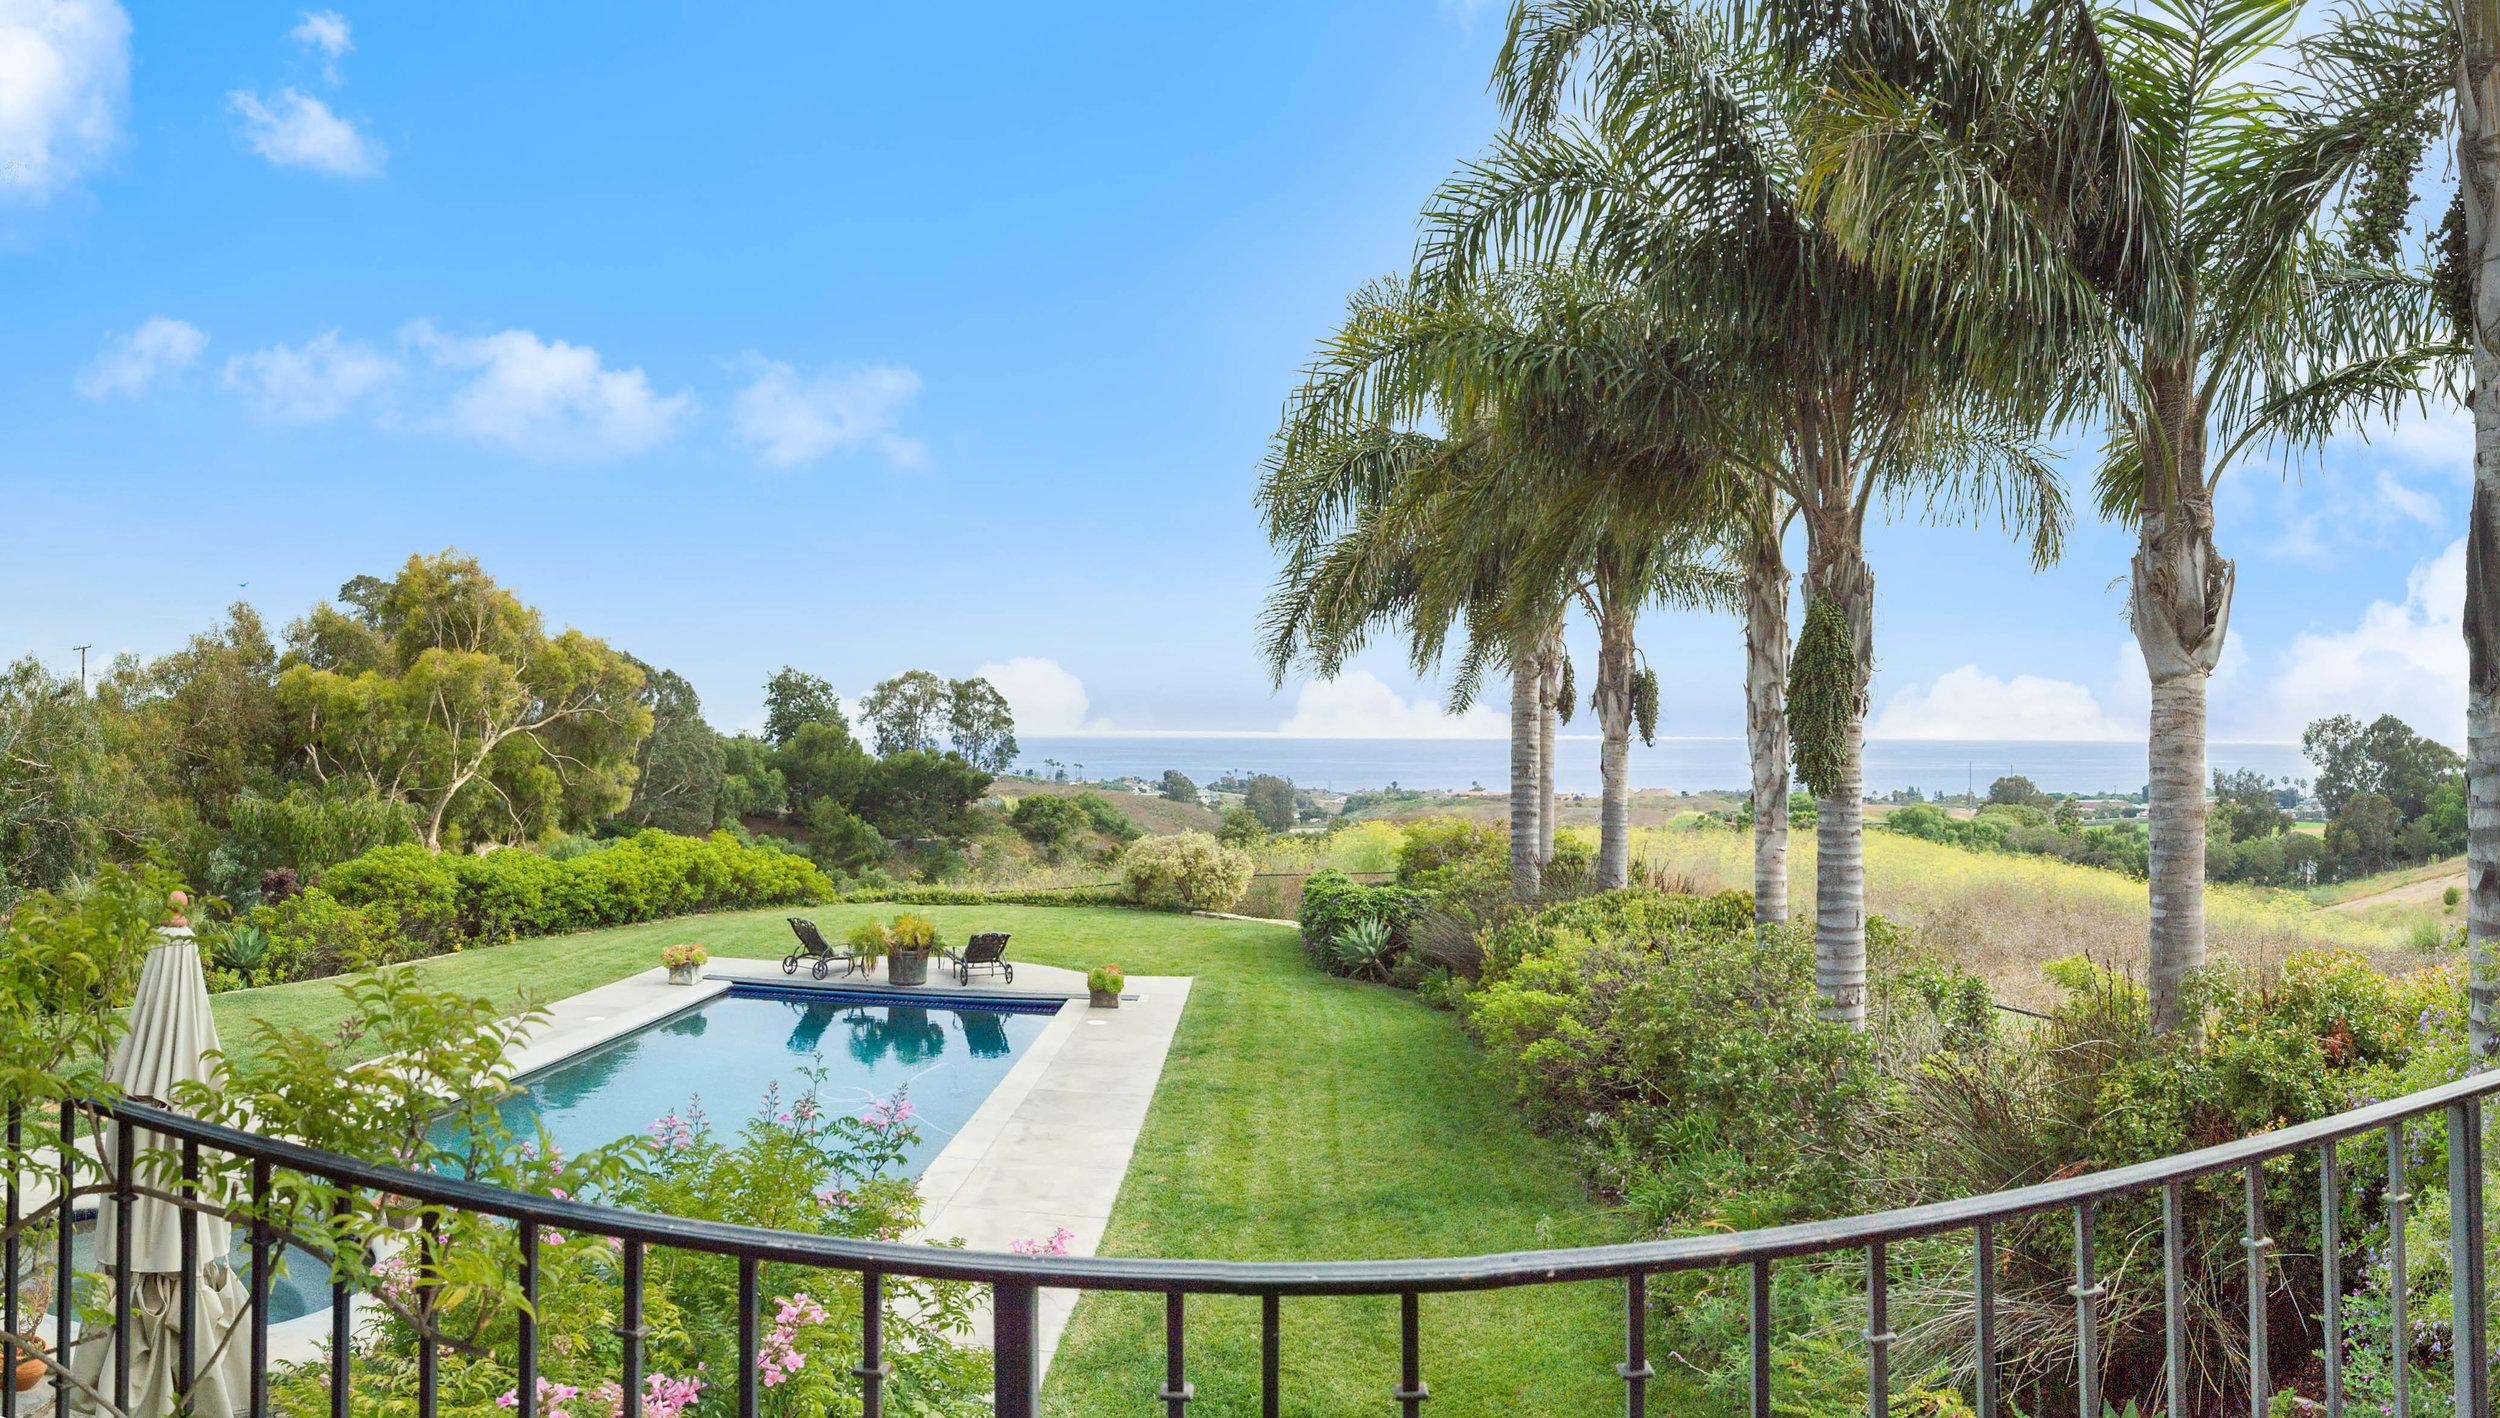 019 master balcony 29660 Harvester Road Malibu For Sale The Malibu Life Team Luxury Real Estate.jpg